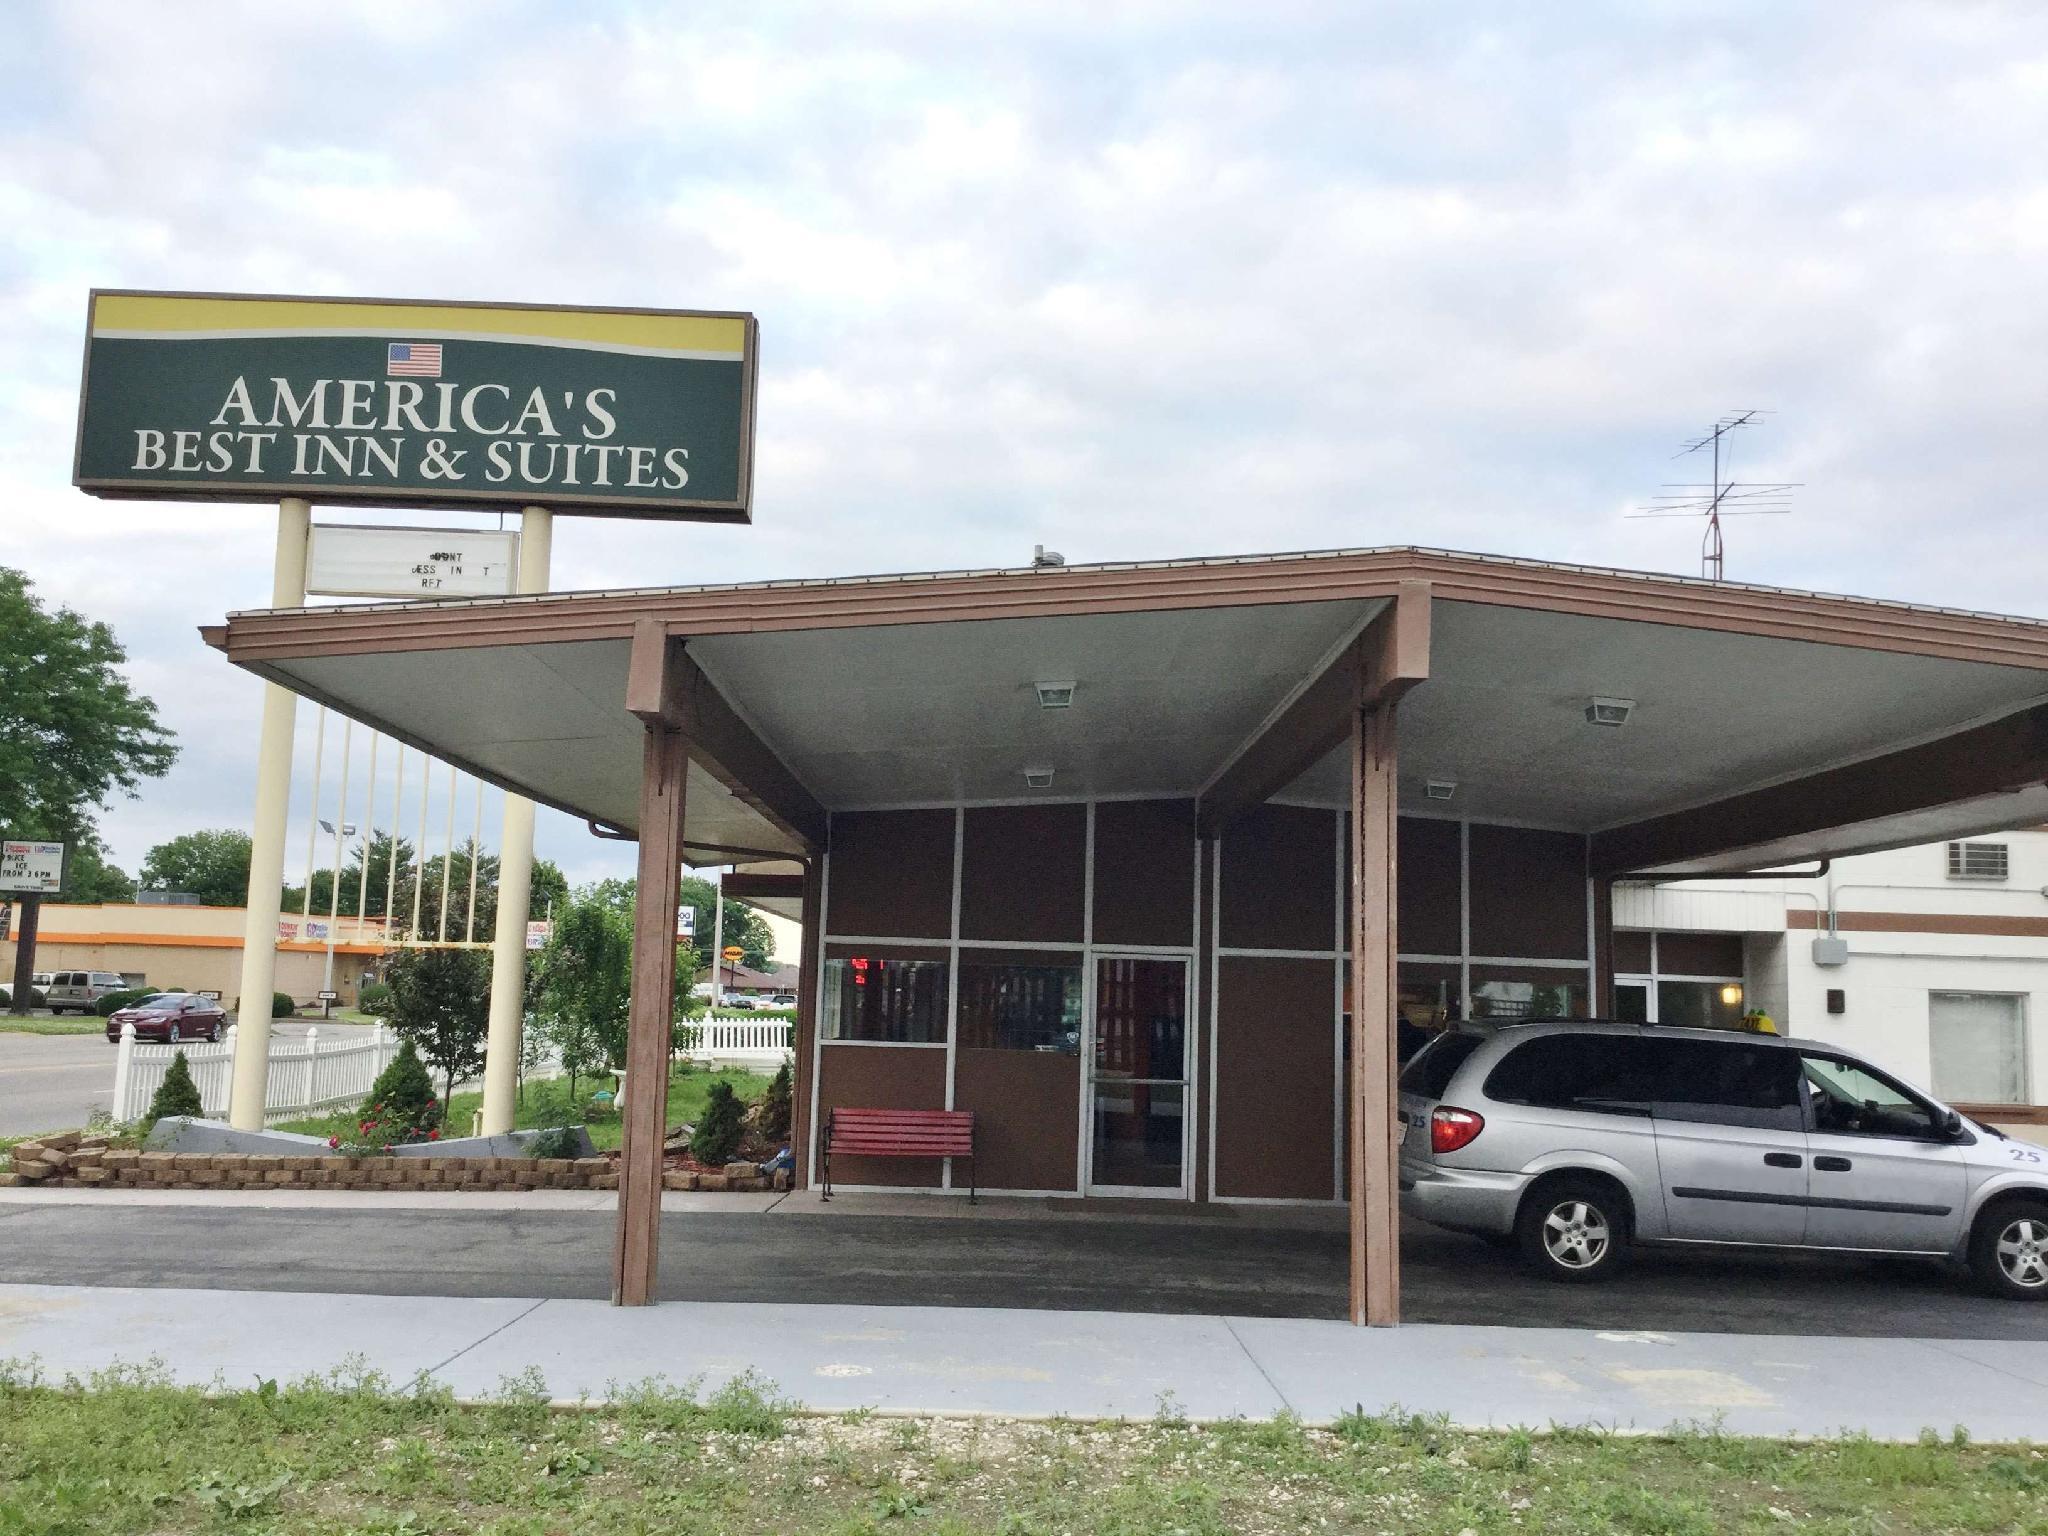 America's Best Inn - Urbana / Campaign, Champaign